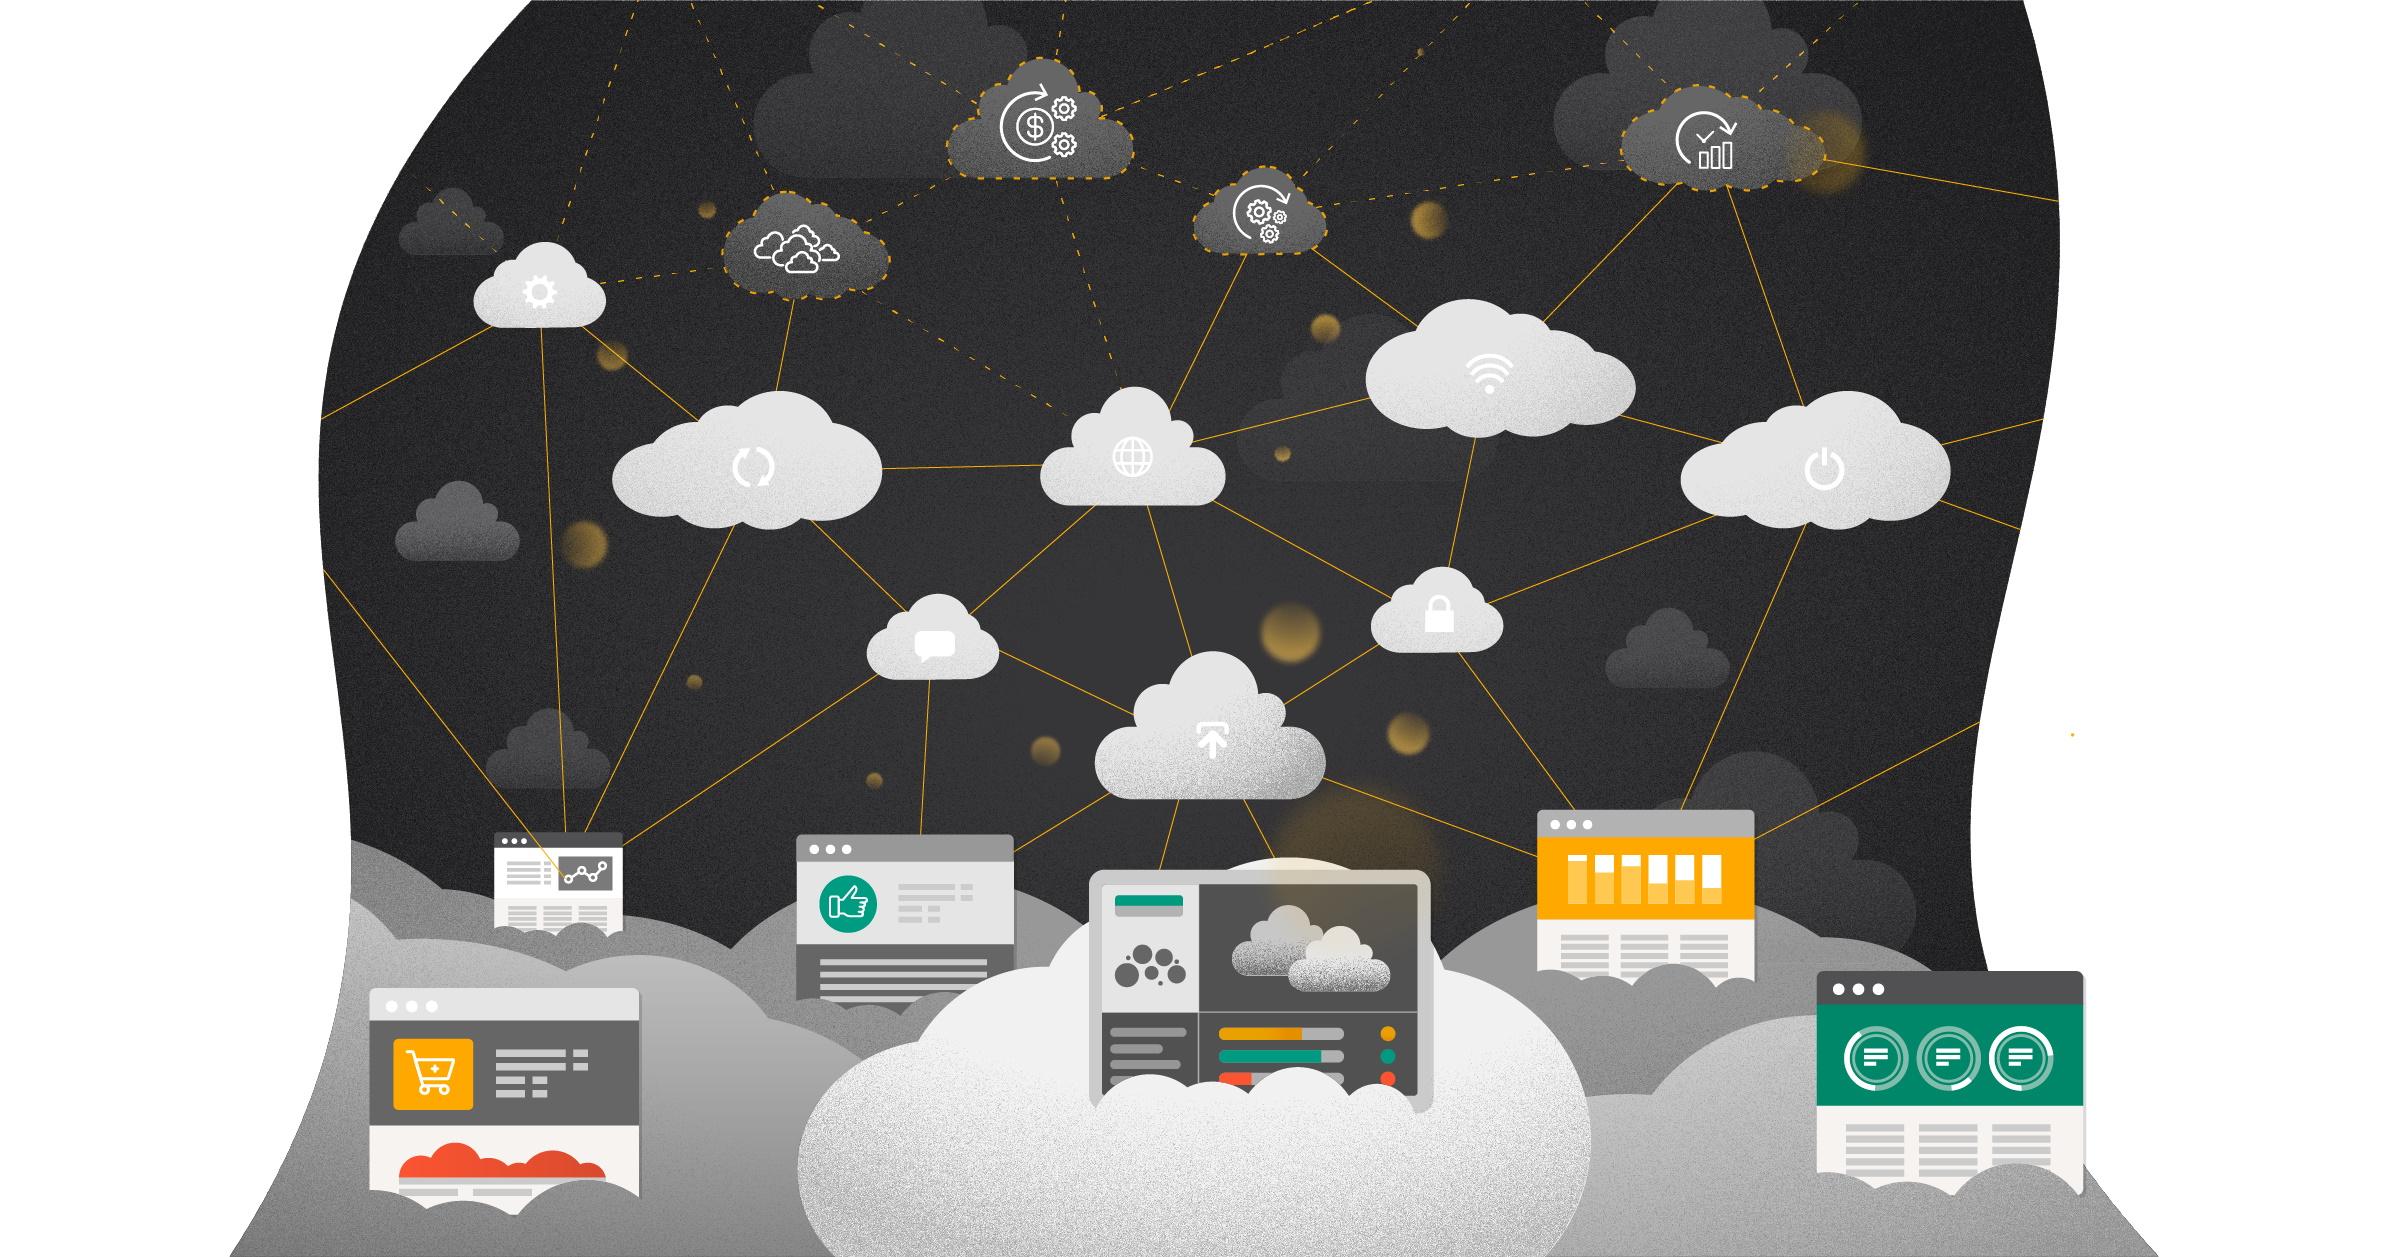 Den langsigtede cloud-arkitektur tilgang